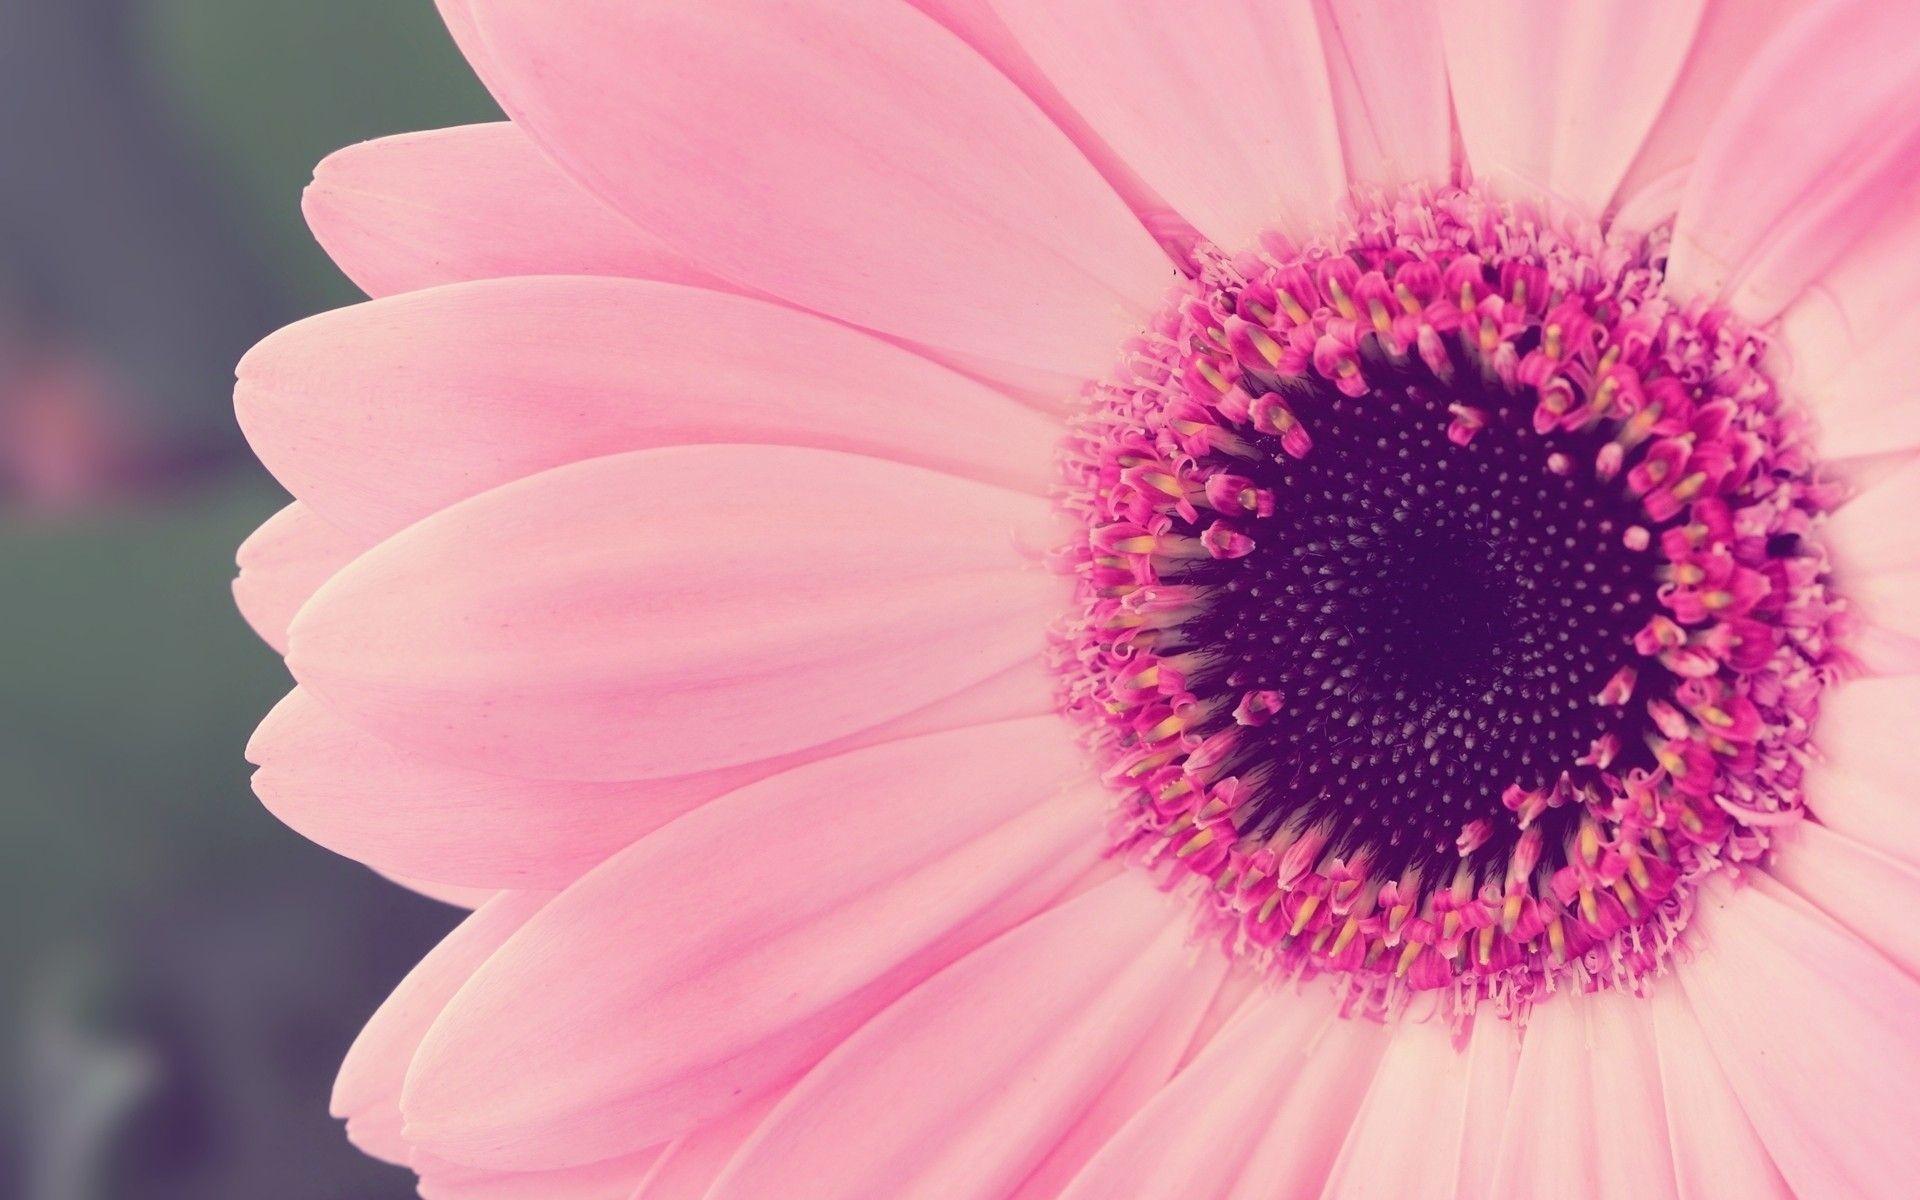 cute pink wallpaper (70+ images)